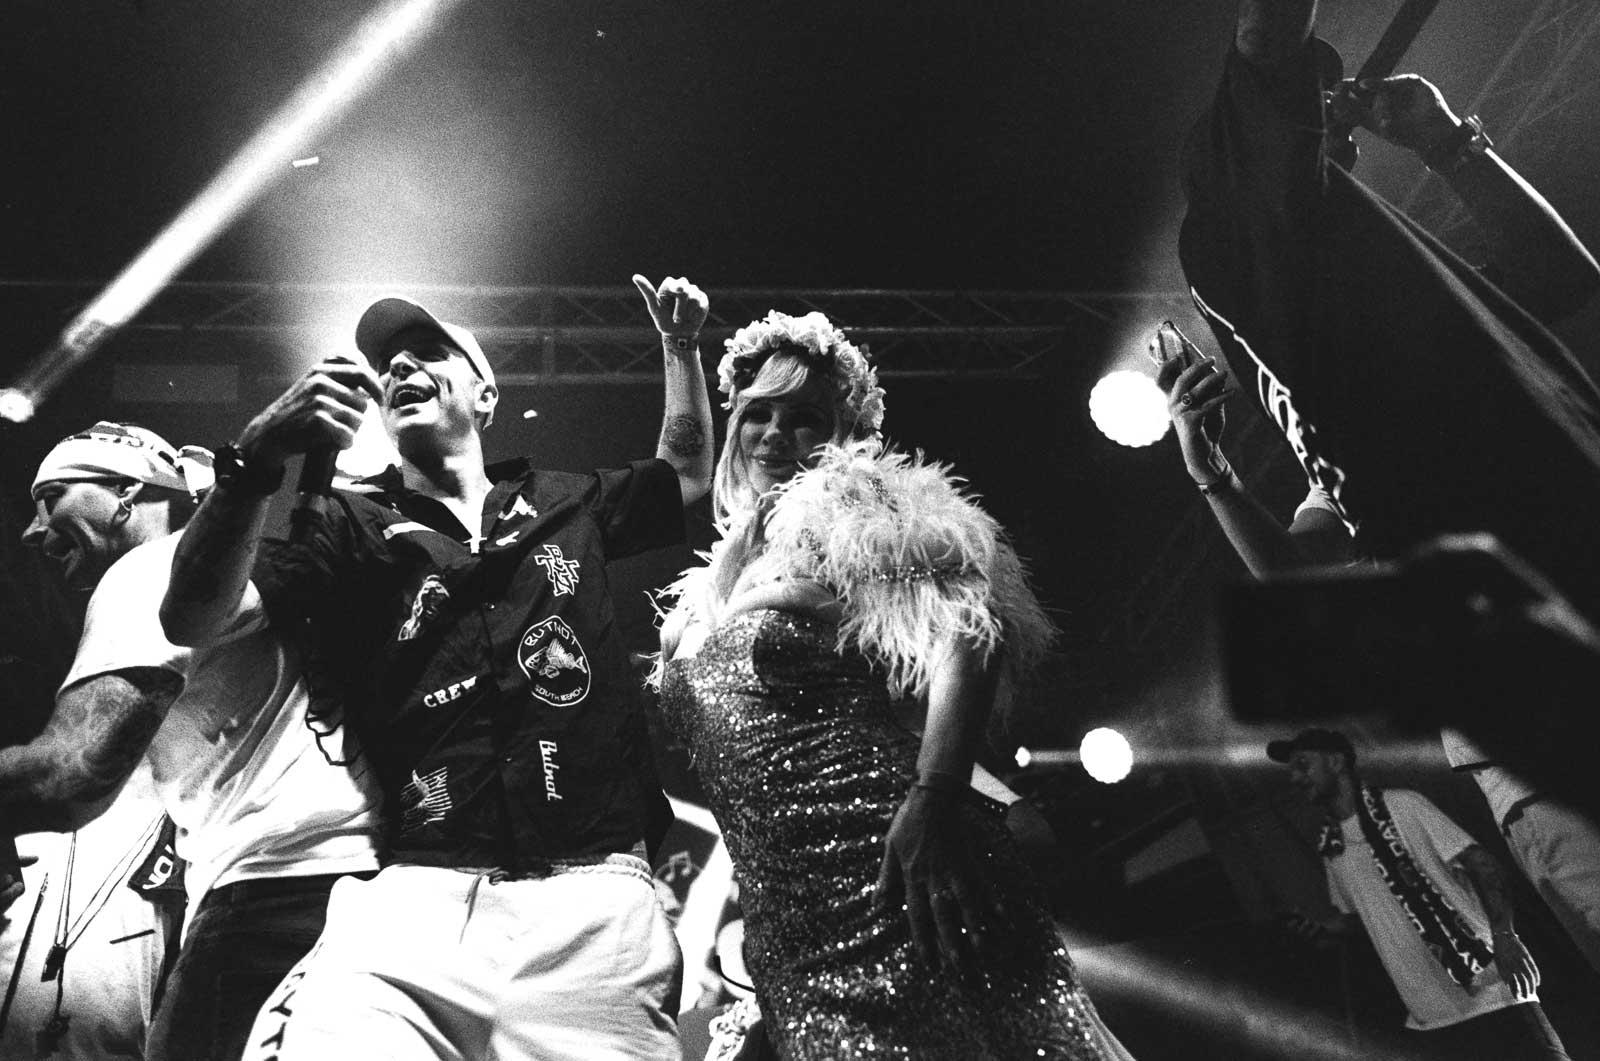 Red Bull Culture Clash, Salmo, Hellmuzik, Barona, foto, gallery, Luca Benedet, Miserianera, Marracash, Noyz Narcos, Nitro, Clementino, Myss Keta, Cicciolina,